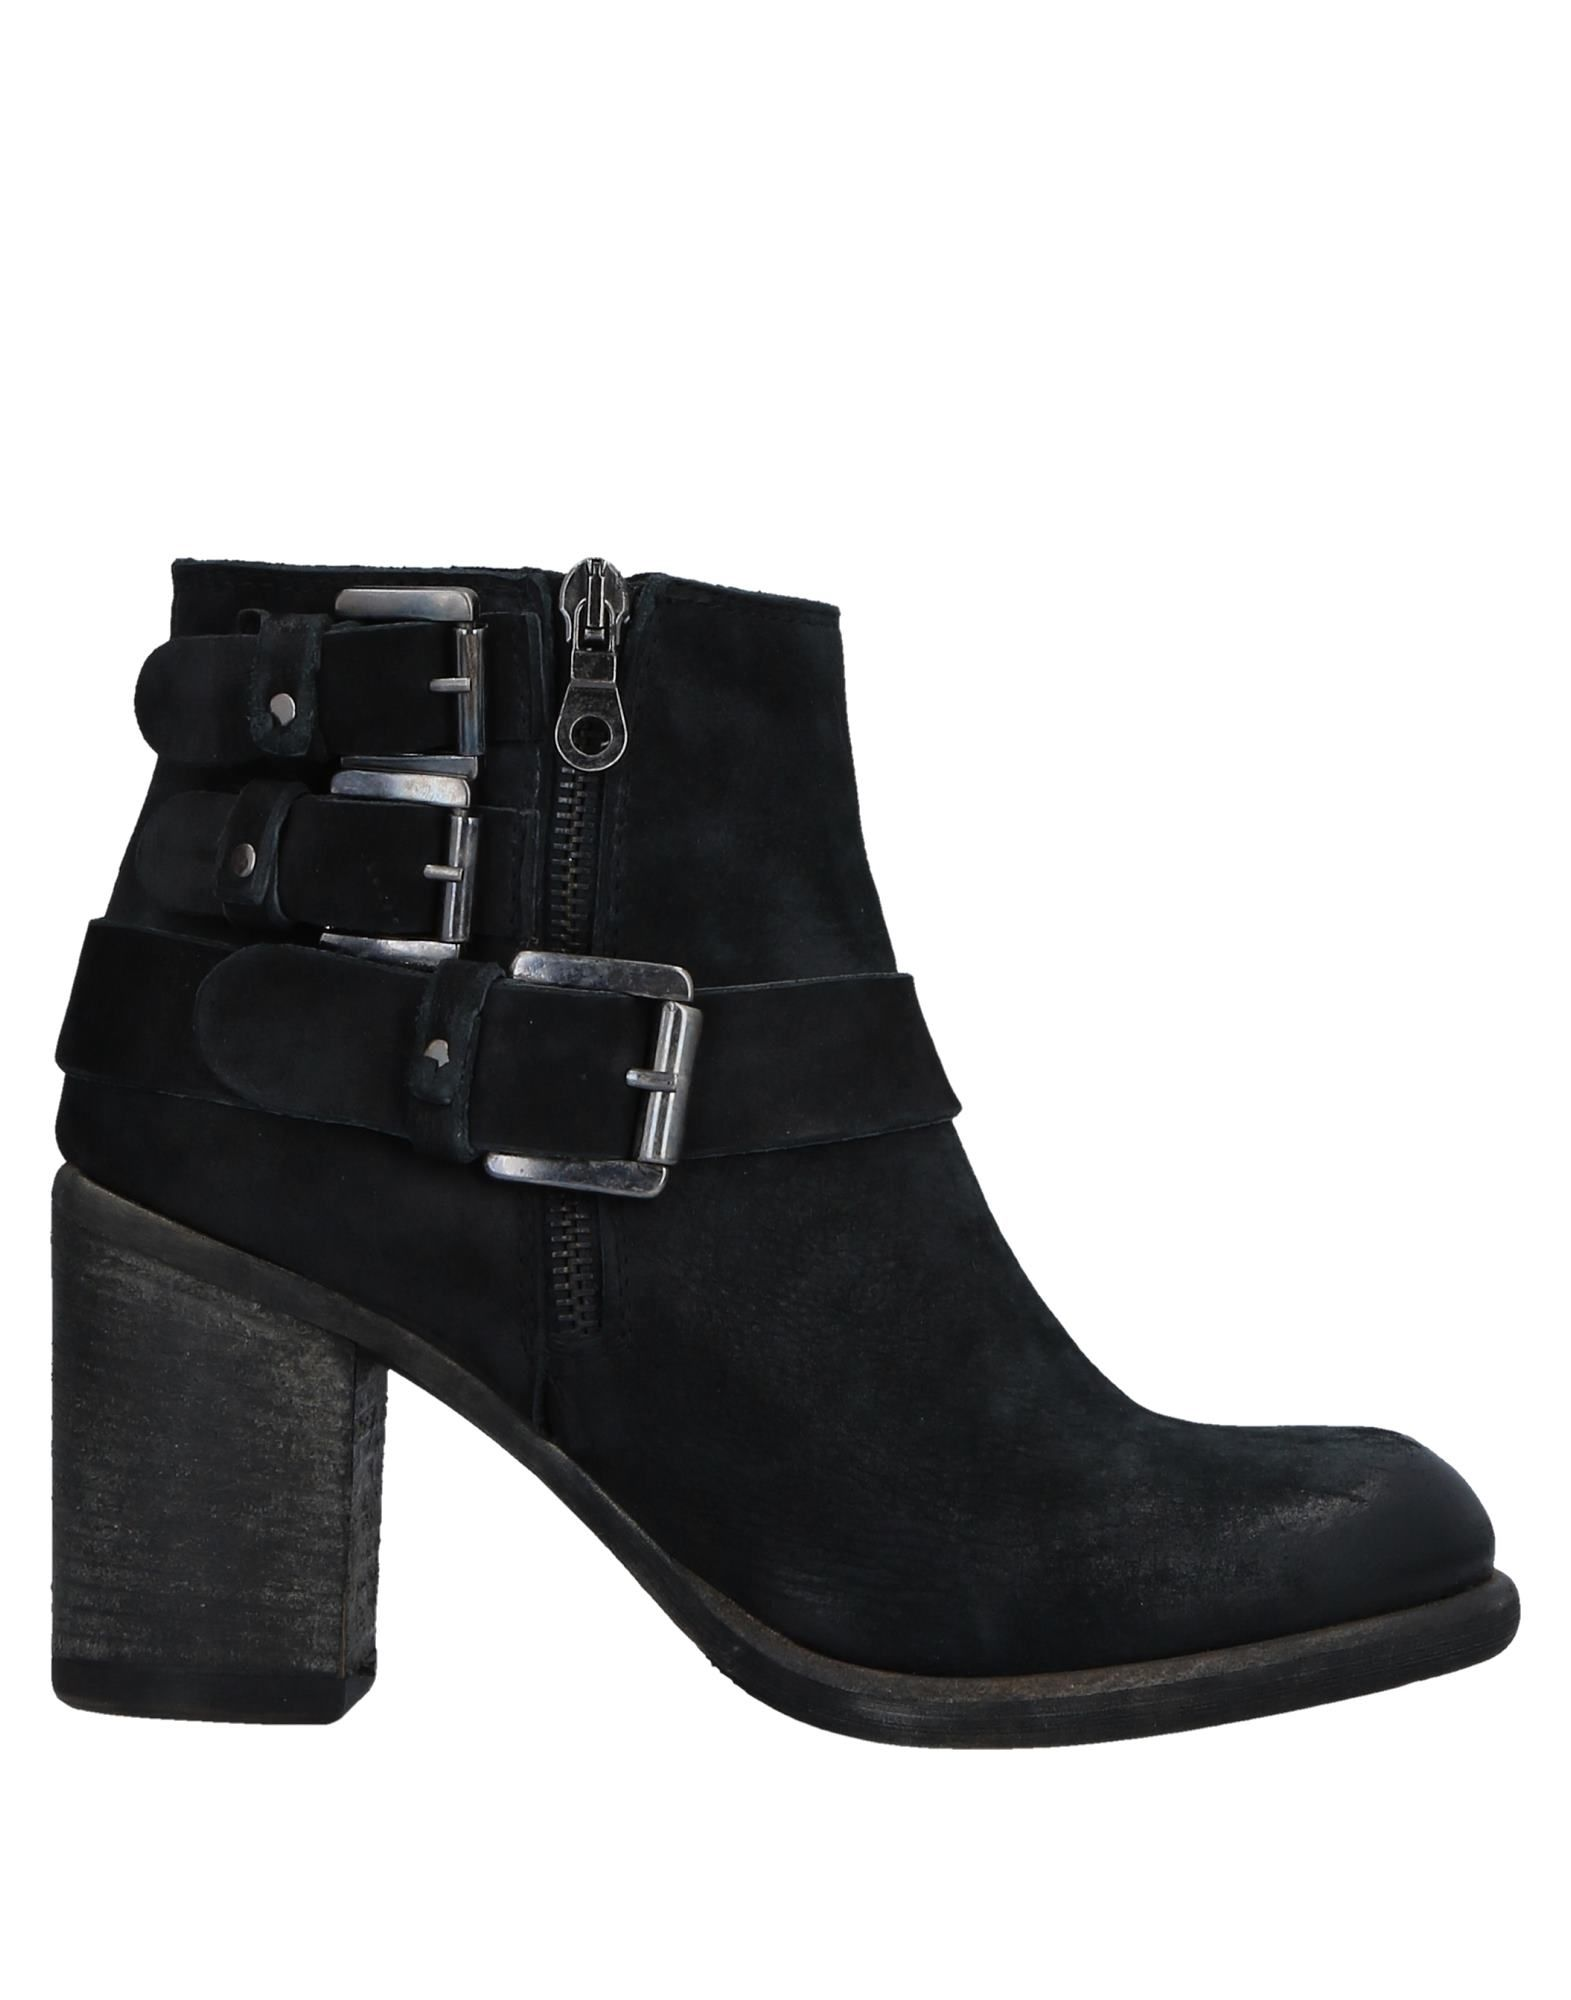 GFG CREAZIONI Полусапоги и высокие ботинки marina creazioni 3560 nero